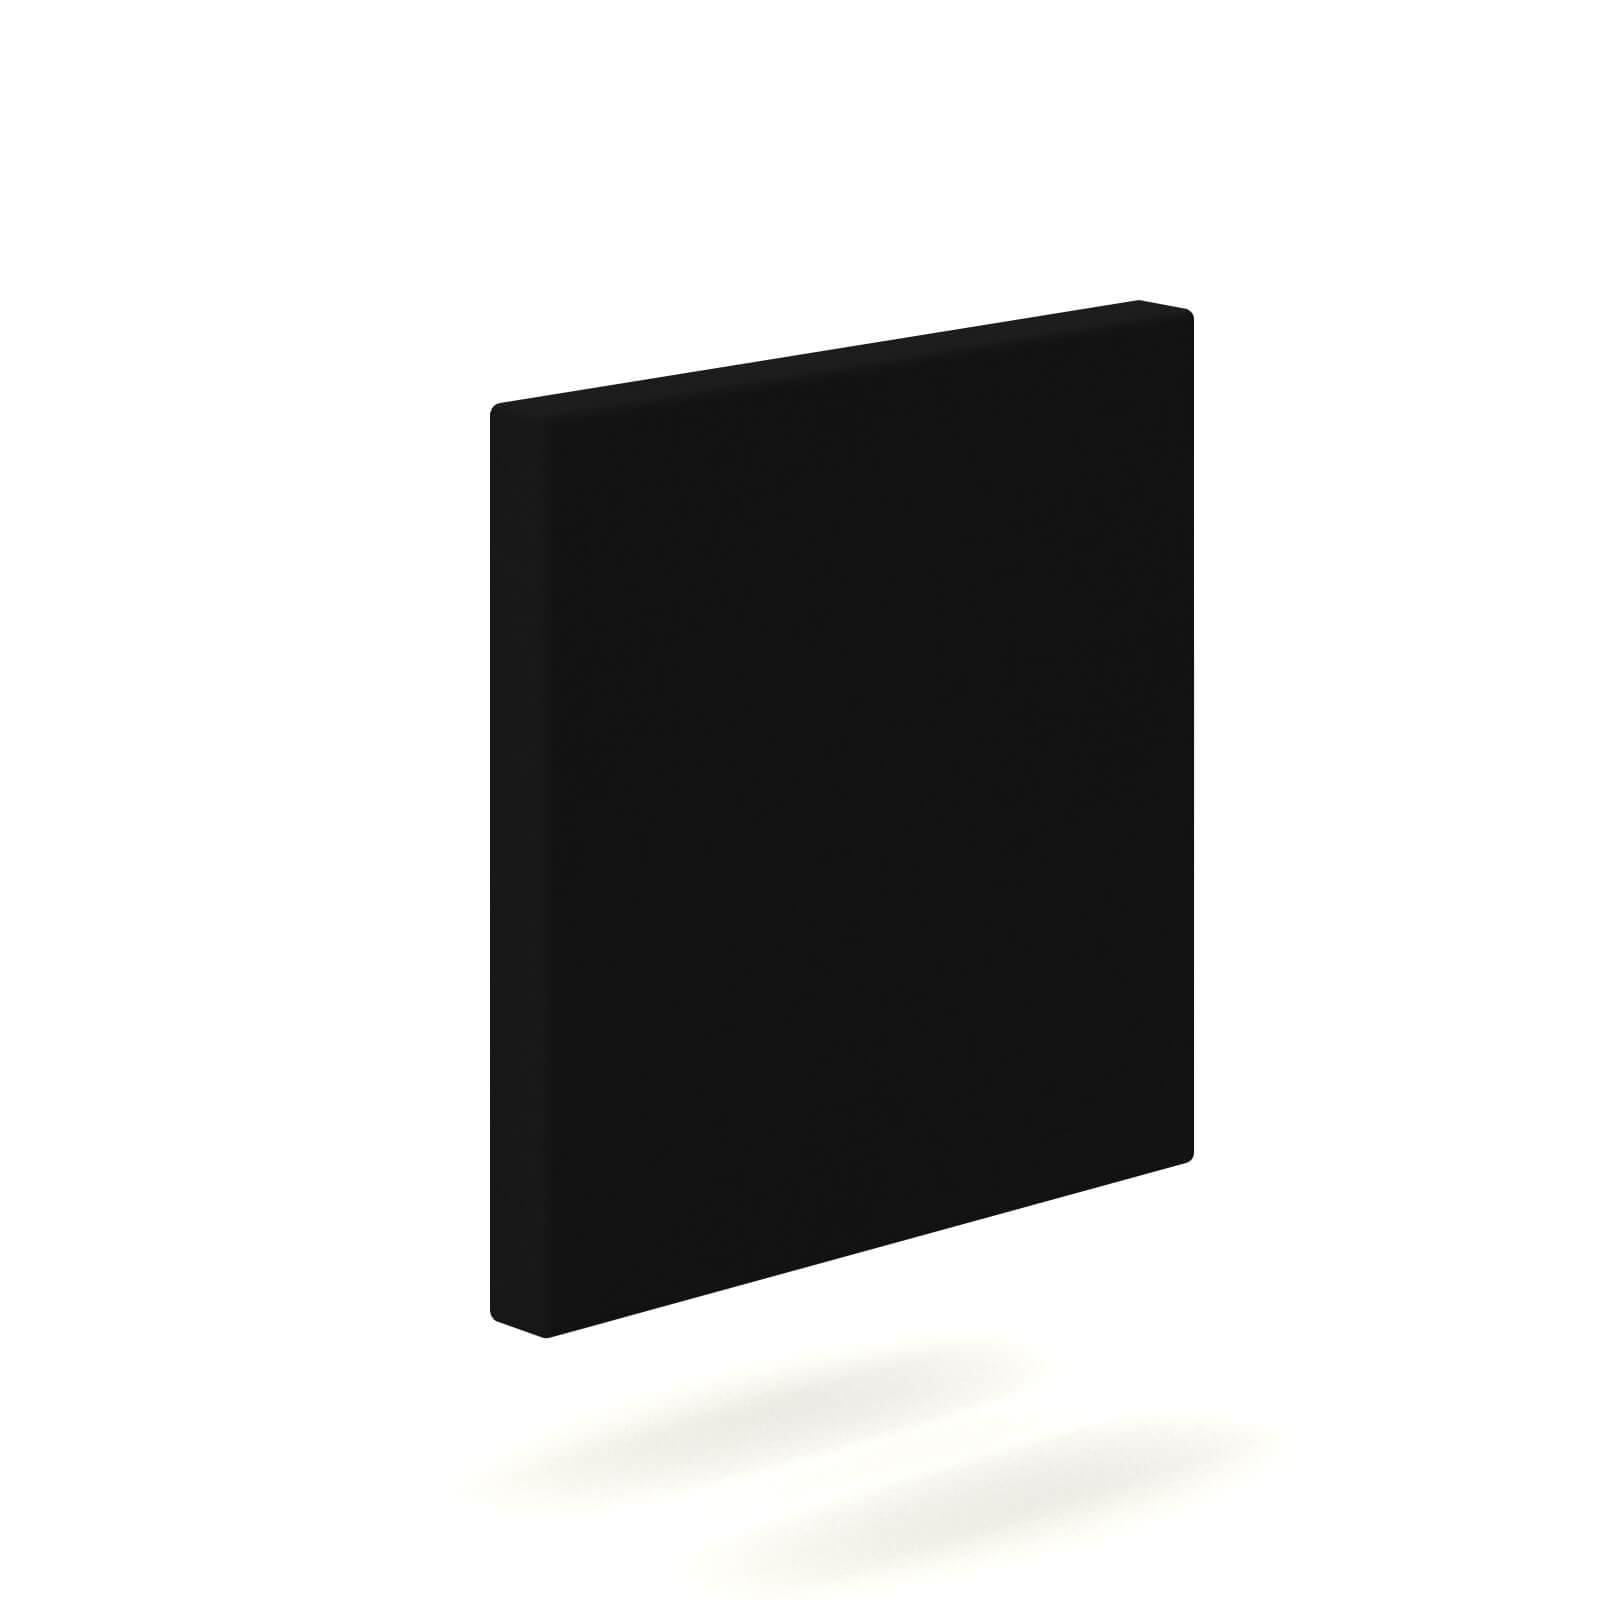 Akustik Wandverkleidung MODUS 400 x 400 mm Akustikplatten Wandpaneele Filz